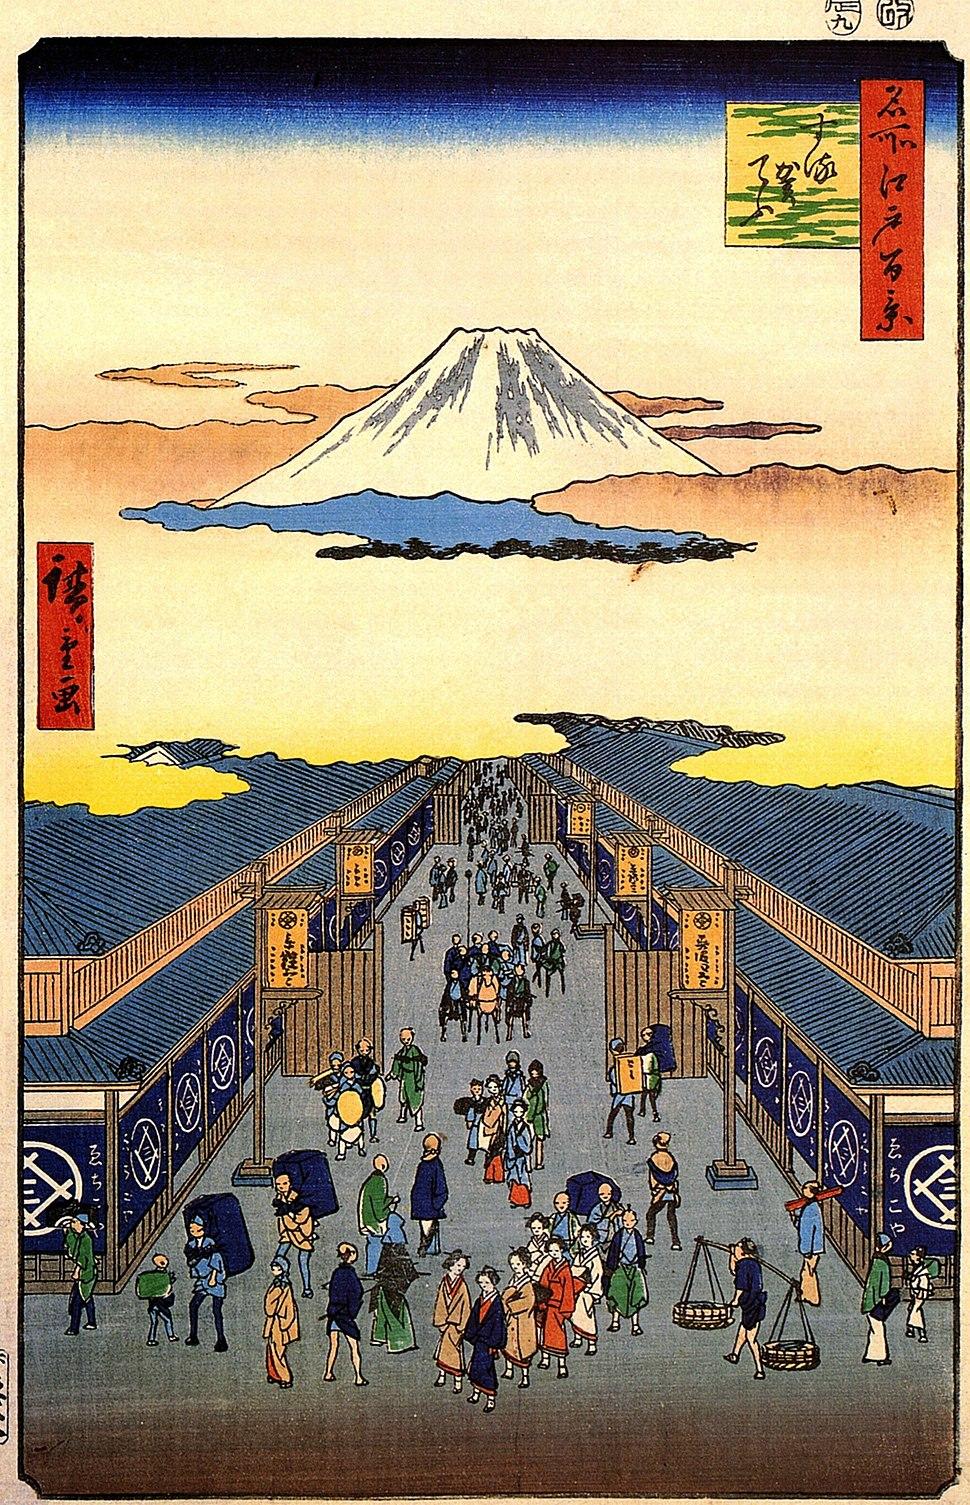 Hiroshige, Sugura street